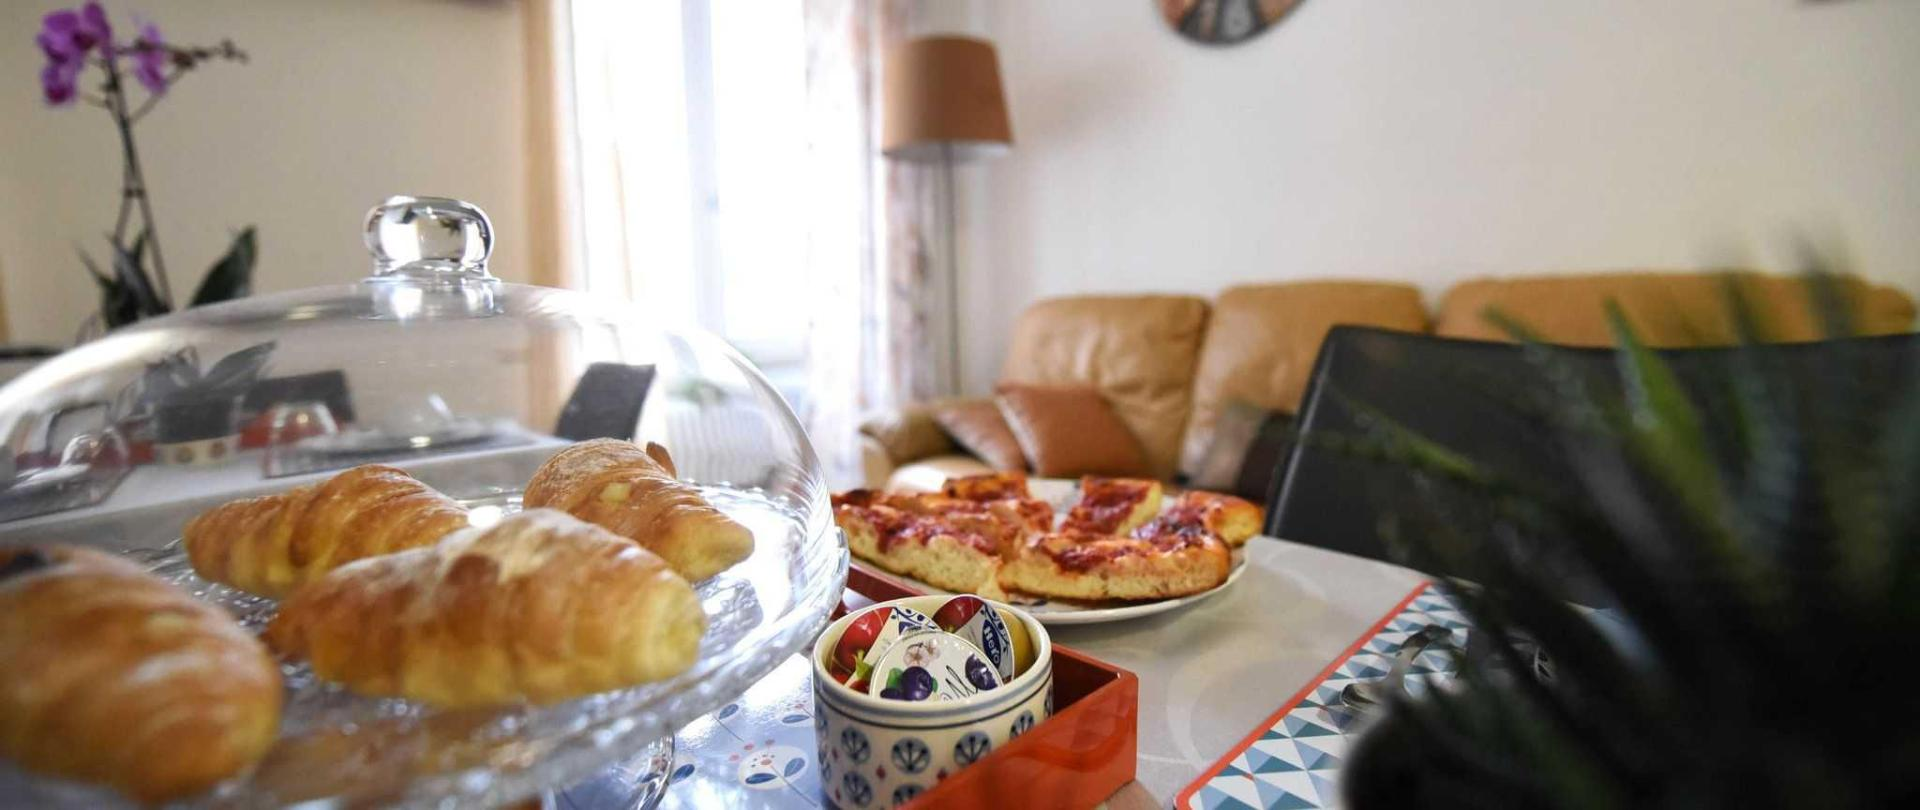 sala-colazione-5.JPG